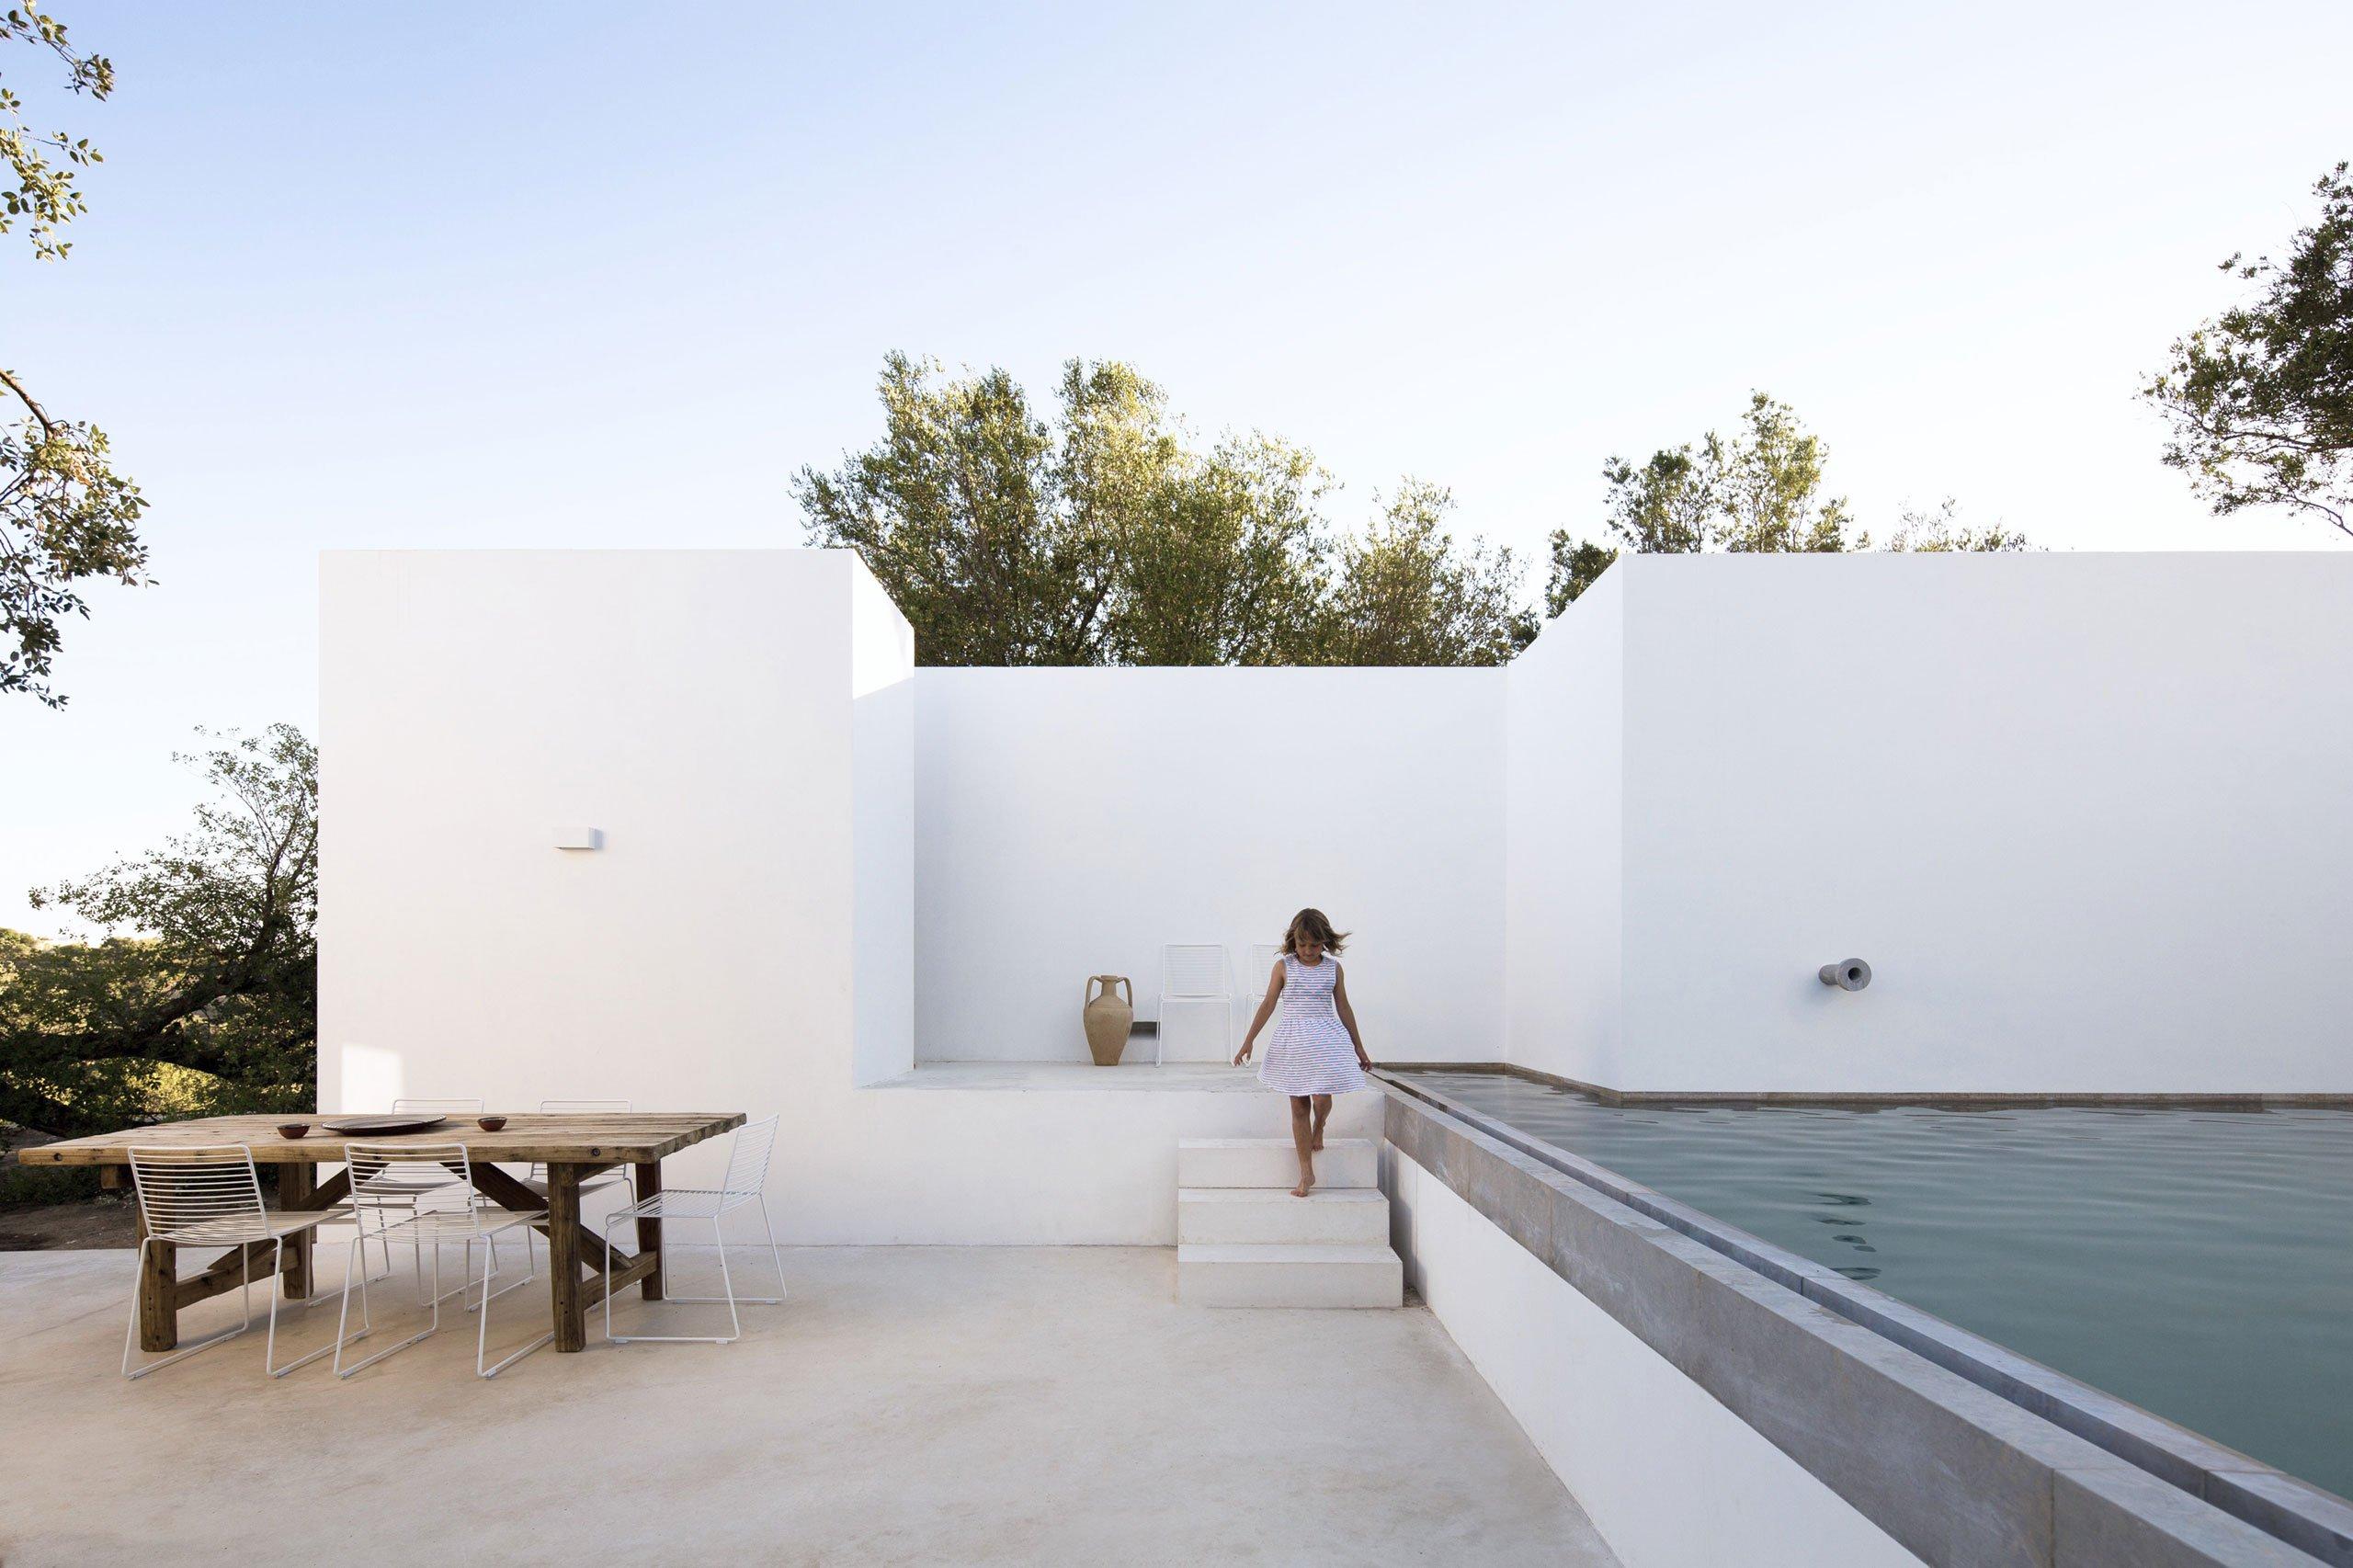 casa-luum-minimalizmus-a-portugal-videken-noko-018.jpg